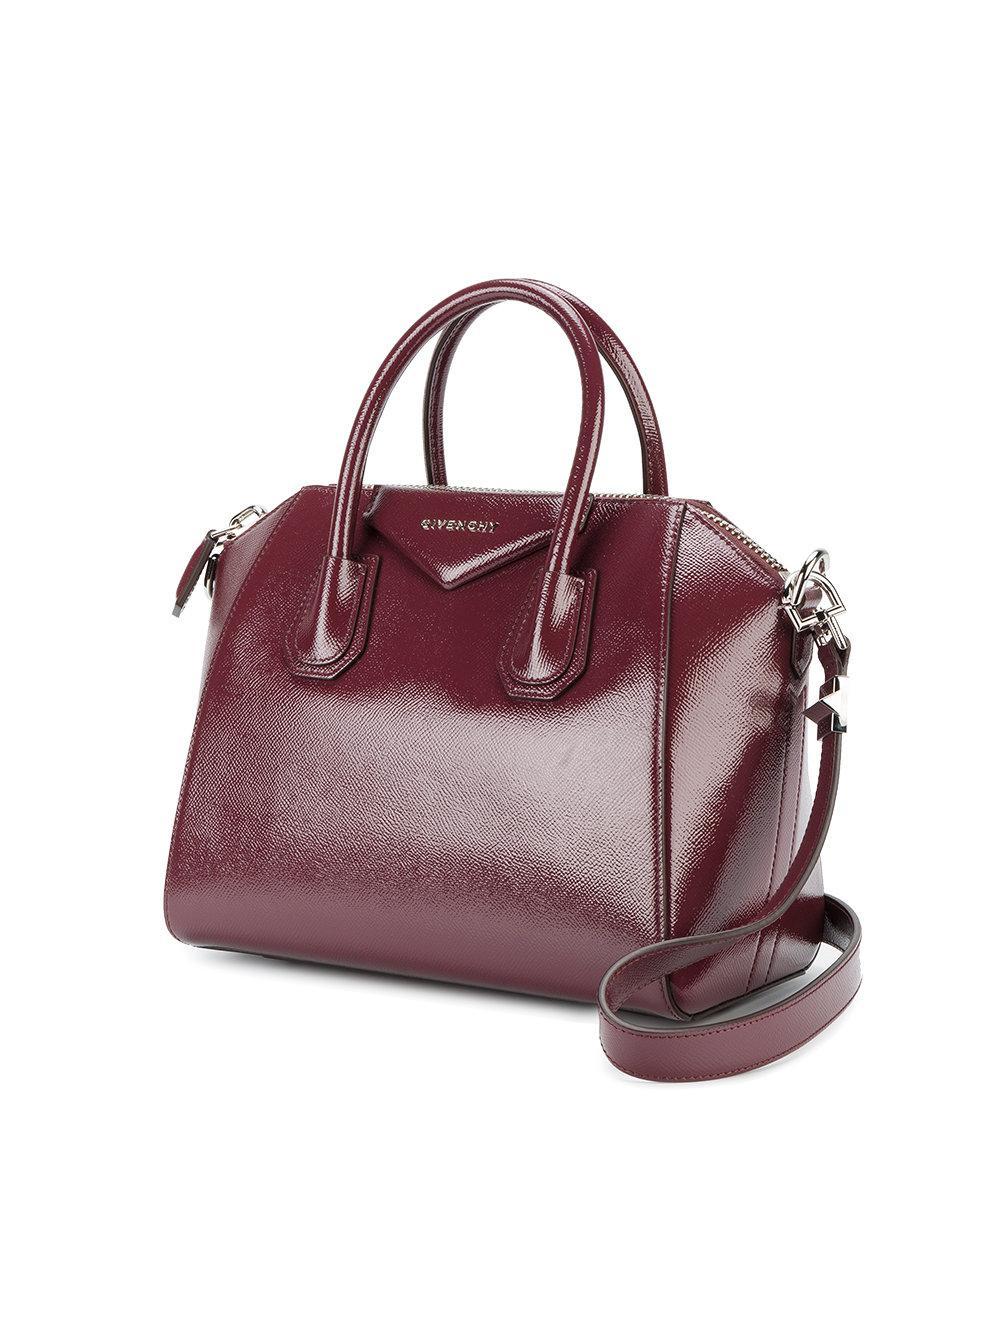 Givenchy Leather Medium Antigona Bag in Red